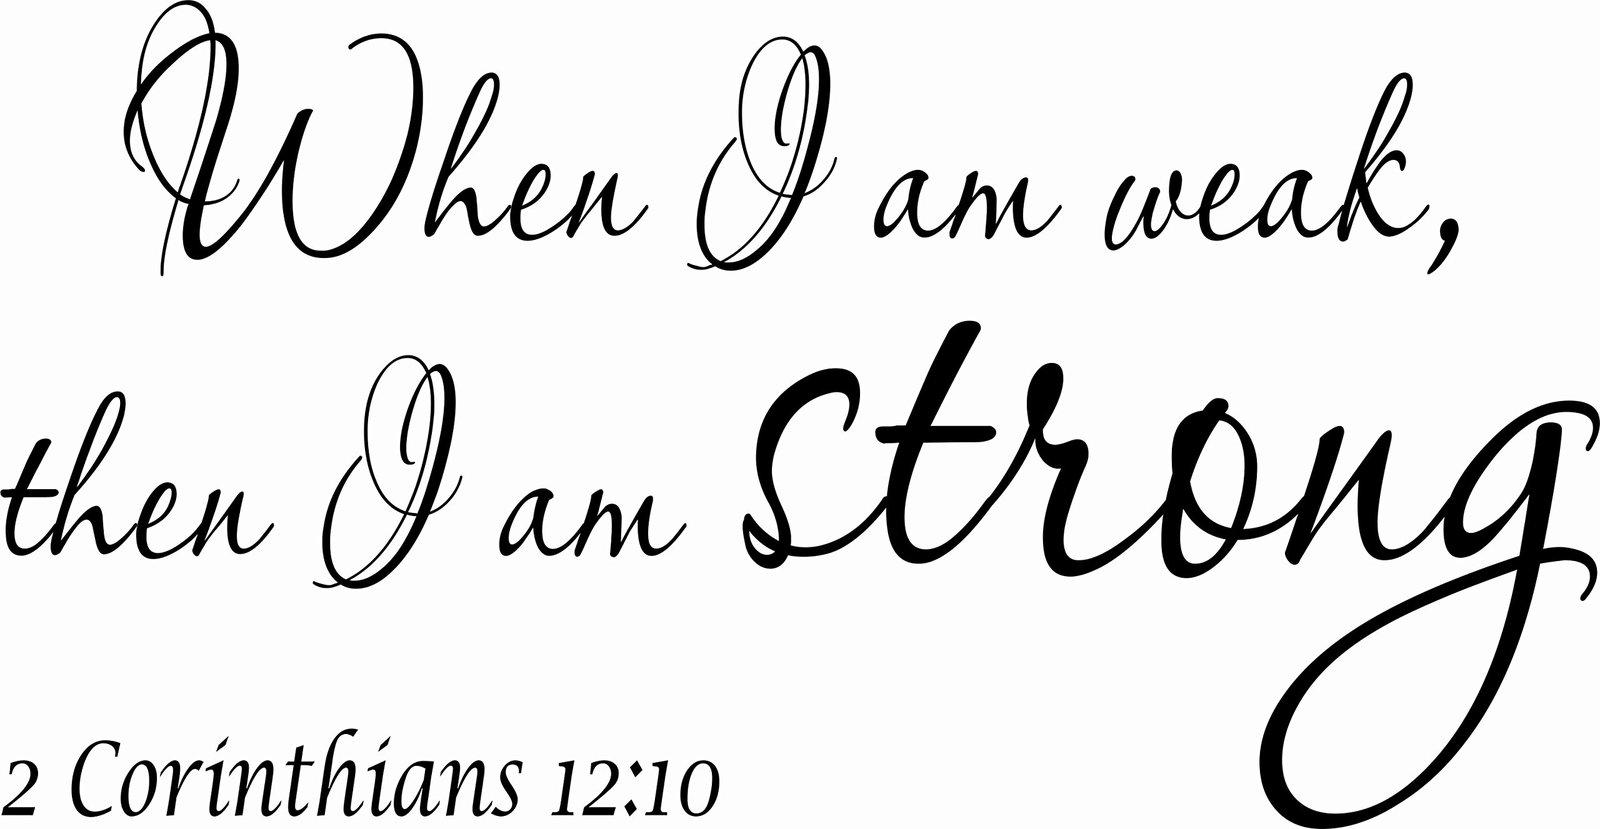 2 Corinthians 12:10 V2 11 x 22 Bible Verse Wall Decal by